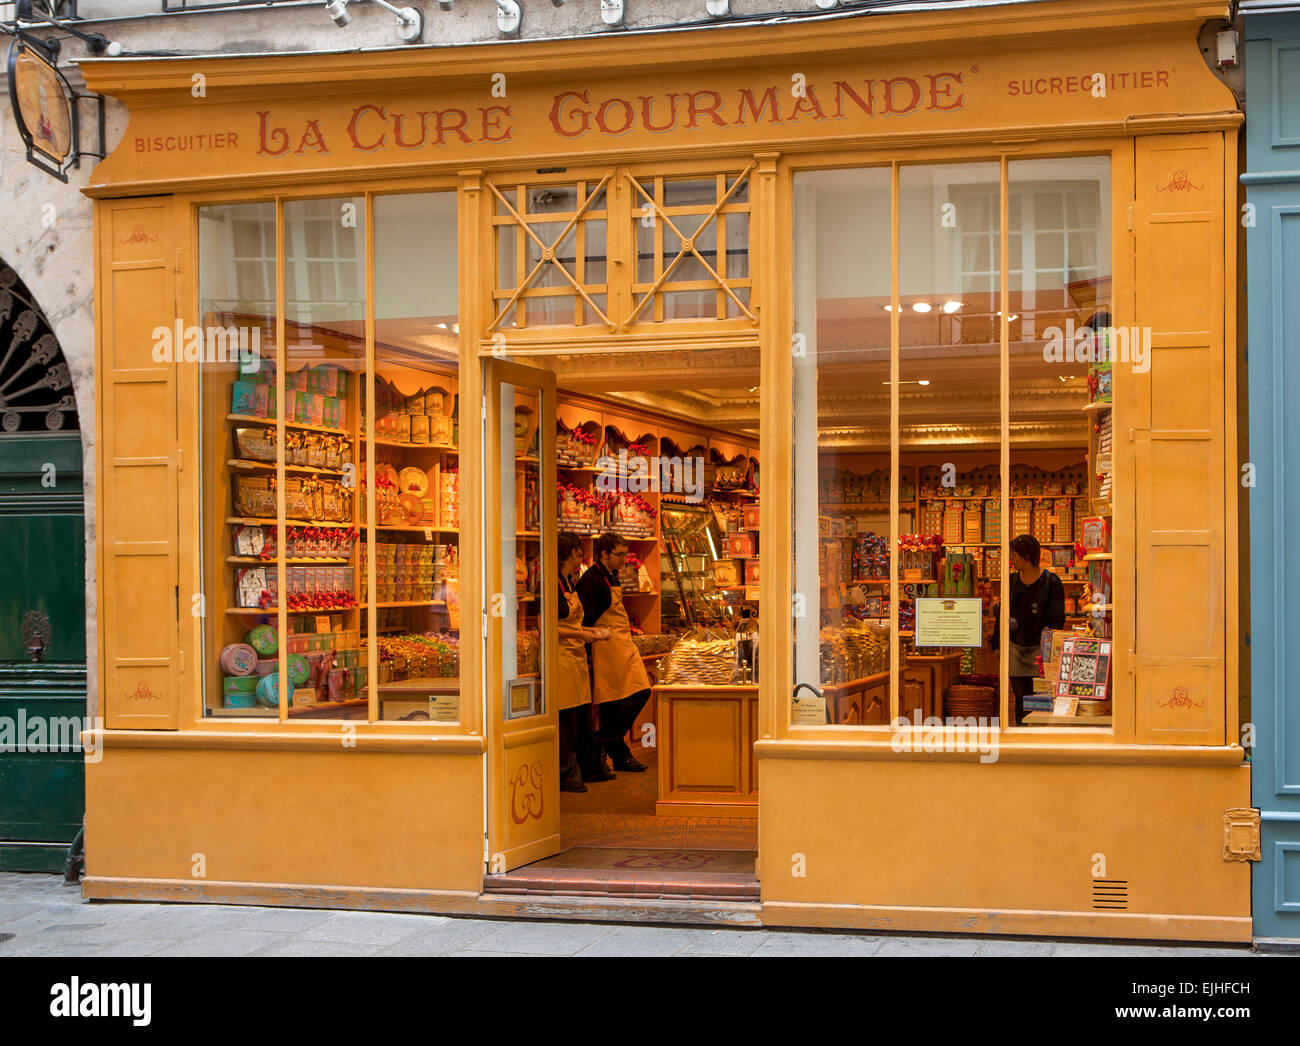 La Cure Gourmande Schokolade und Kekse Shop, Paris, Frankreich Stockbild